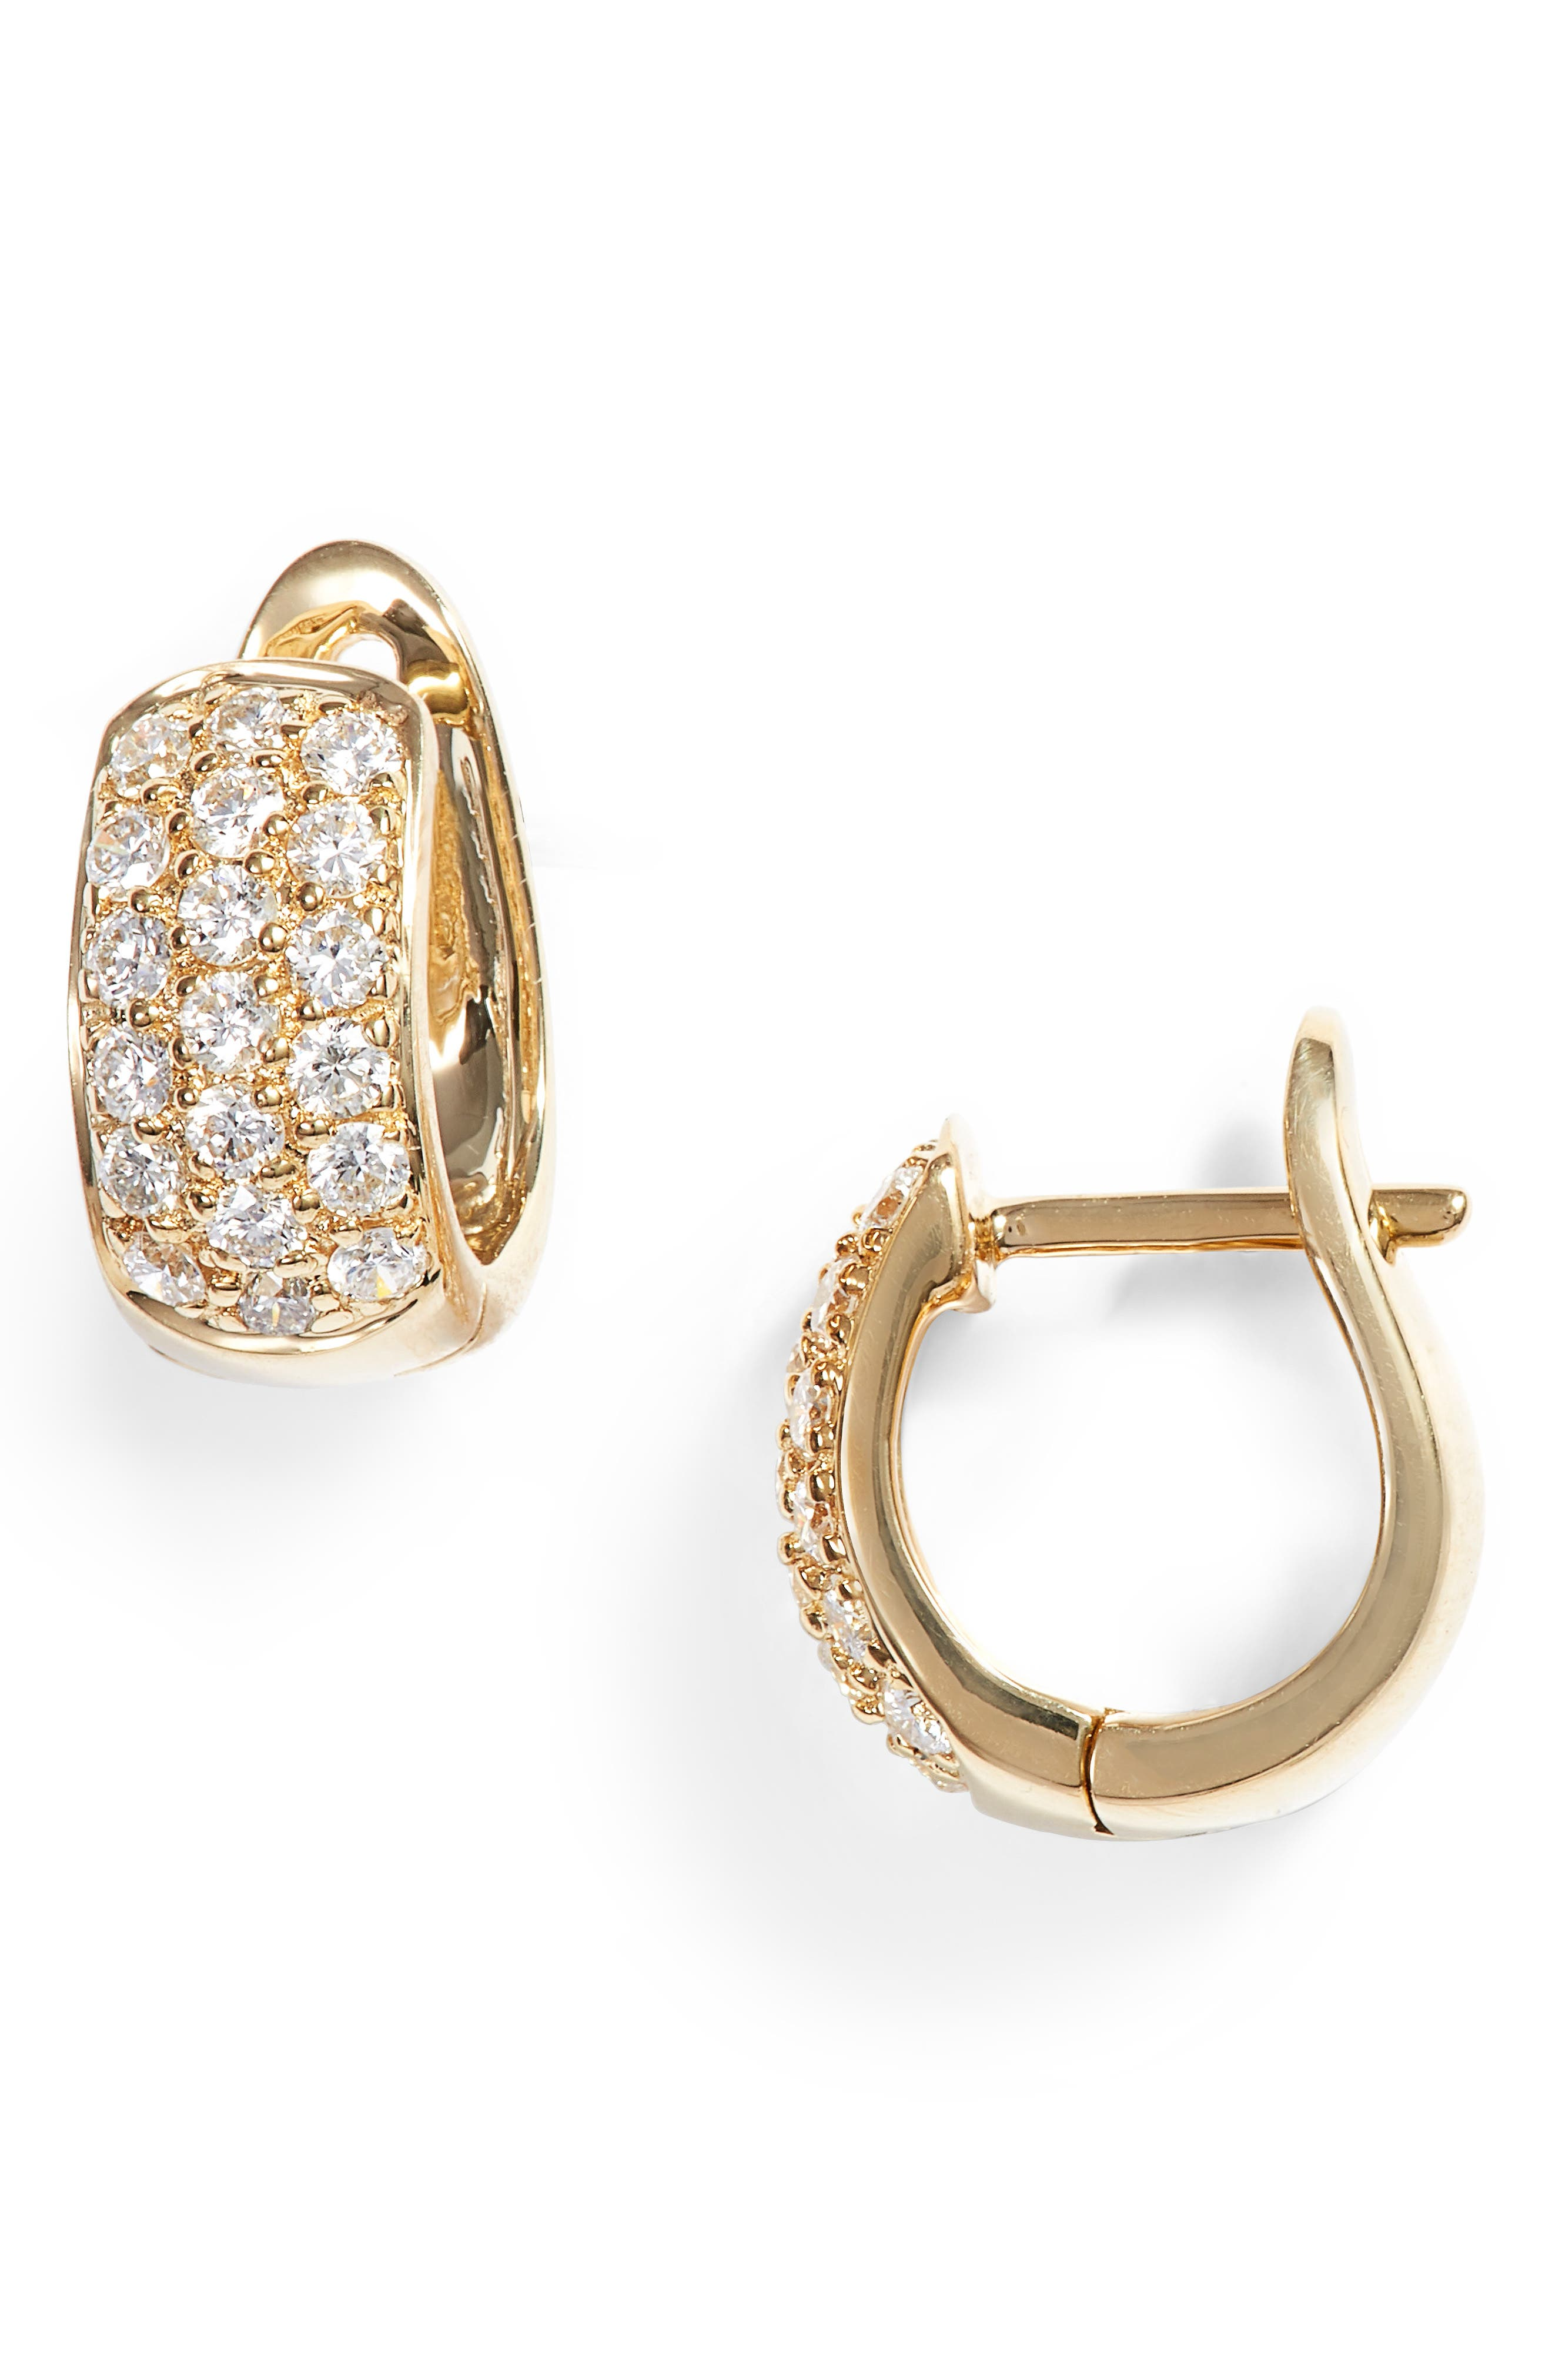 Dana Rebecca Mini Diamond Hoop Earrings,                             Main thumbnail 1, color,                             YELLOW GOLD